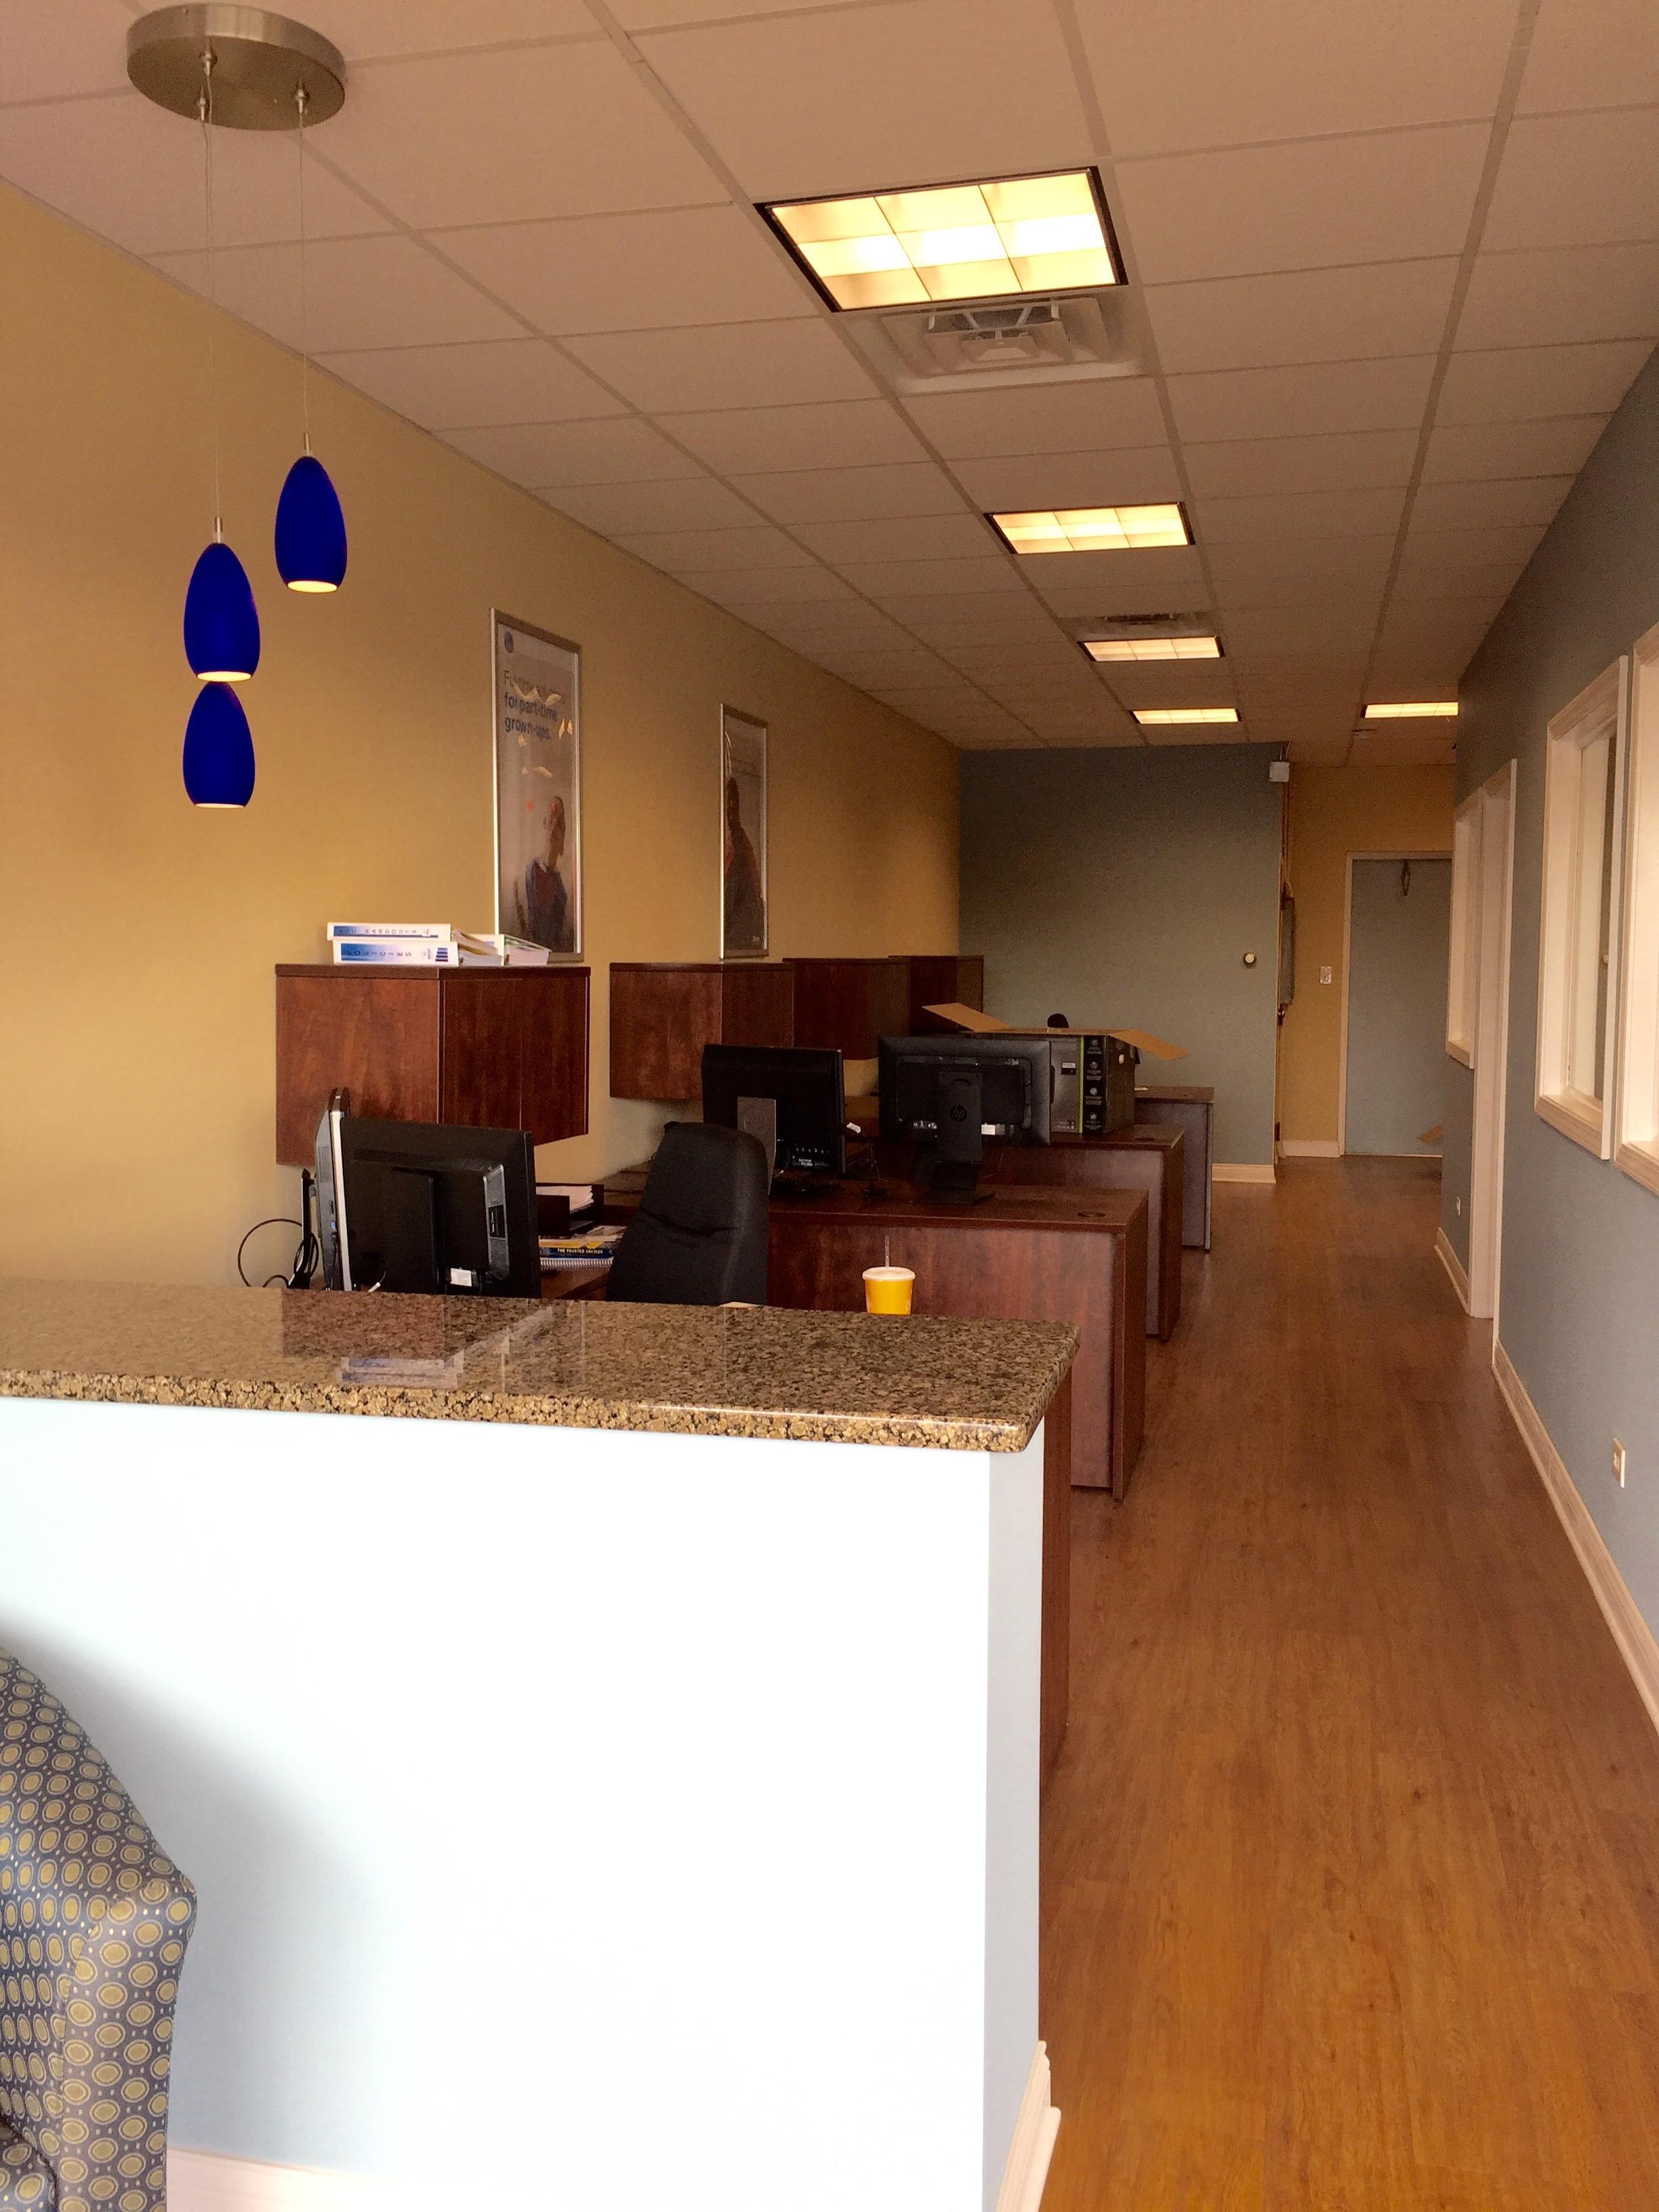 Allstate Insurance Agent: Tom Murray image 4